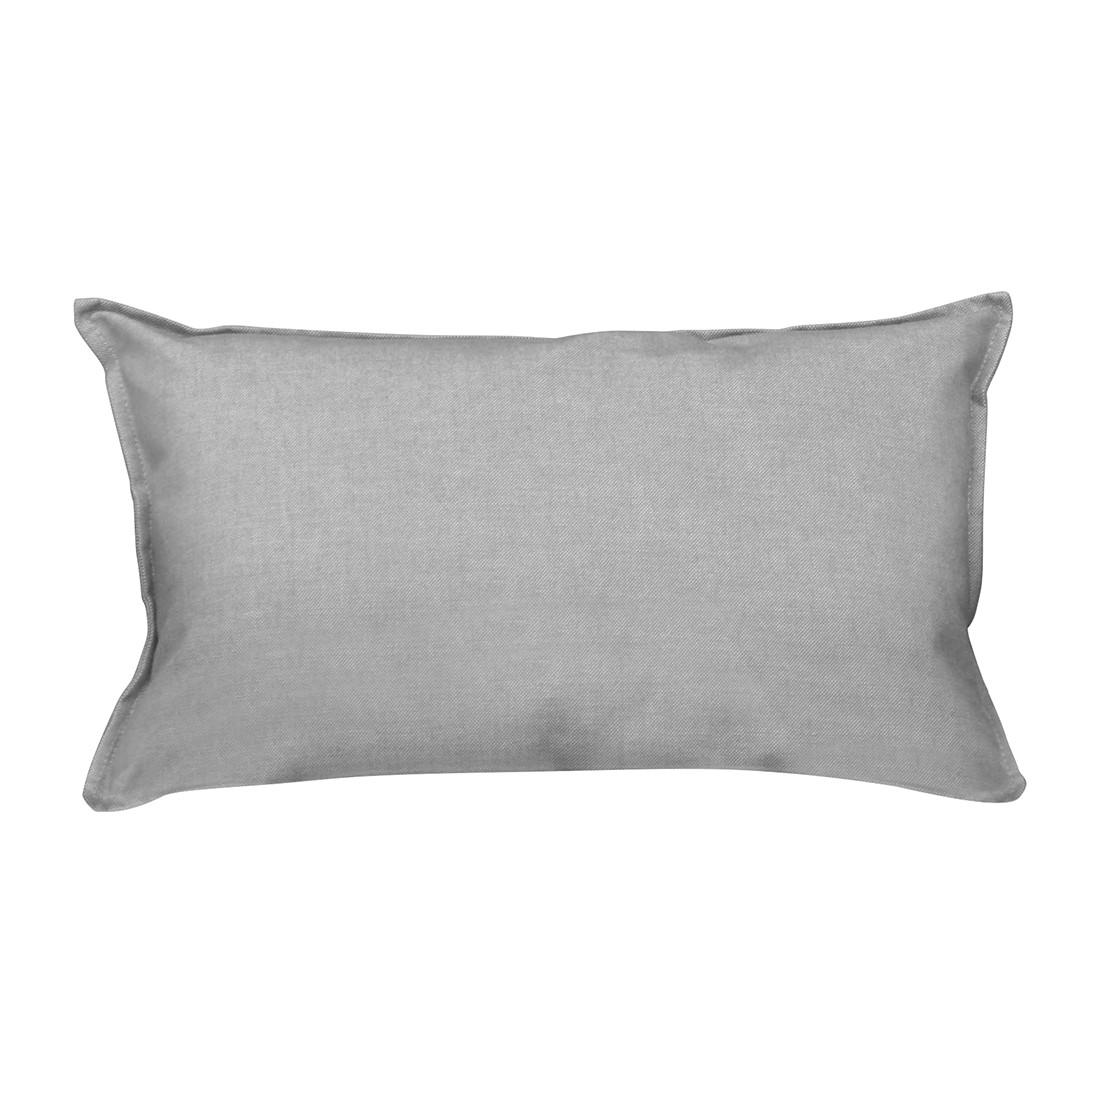 Kissen Pillow - Webstoff Taupe, Jan Kurtz